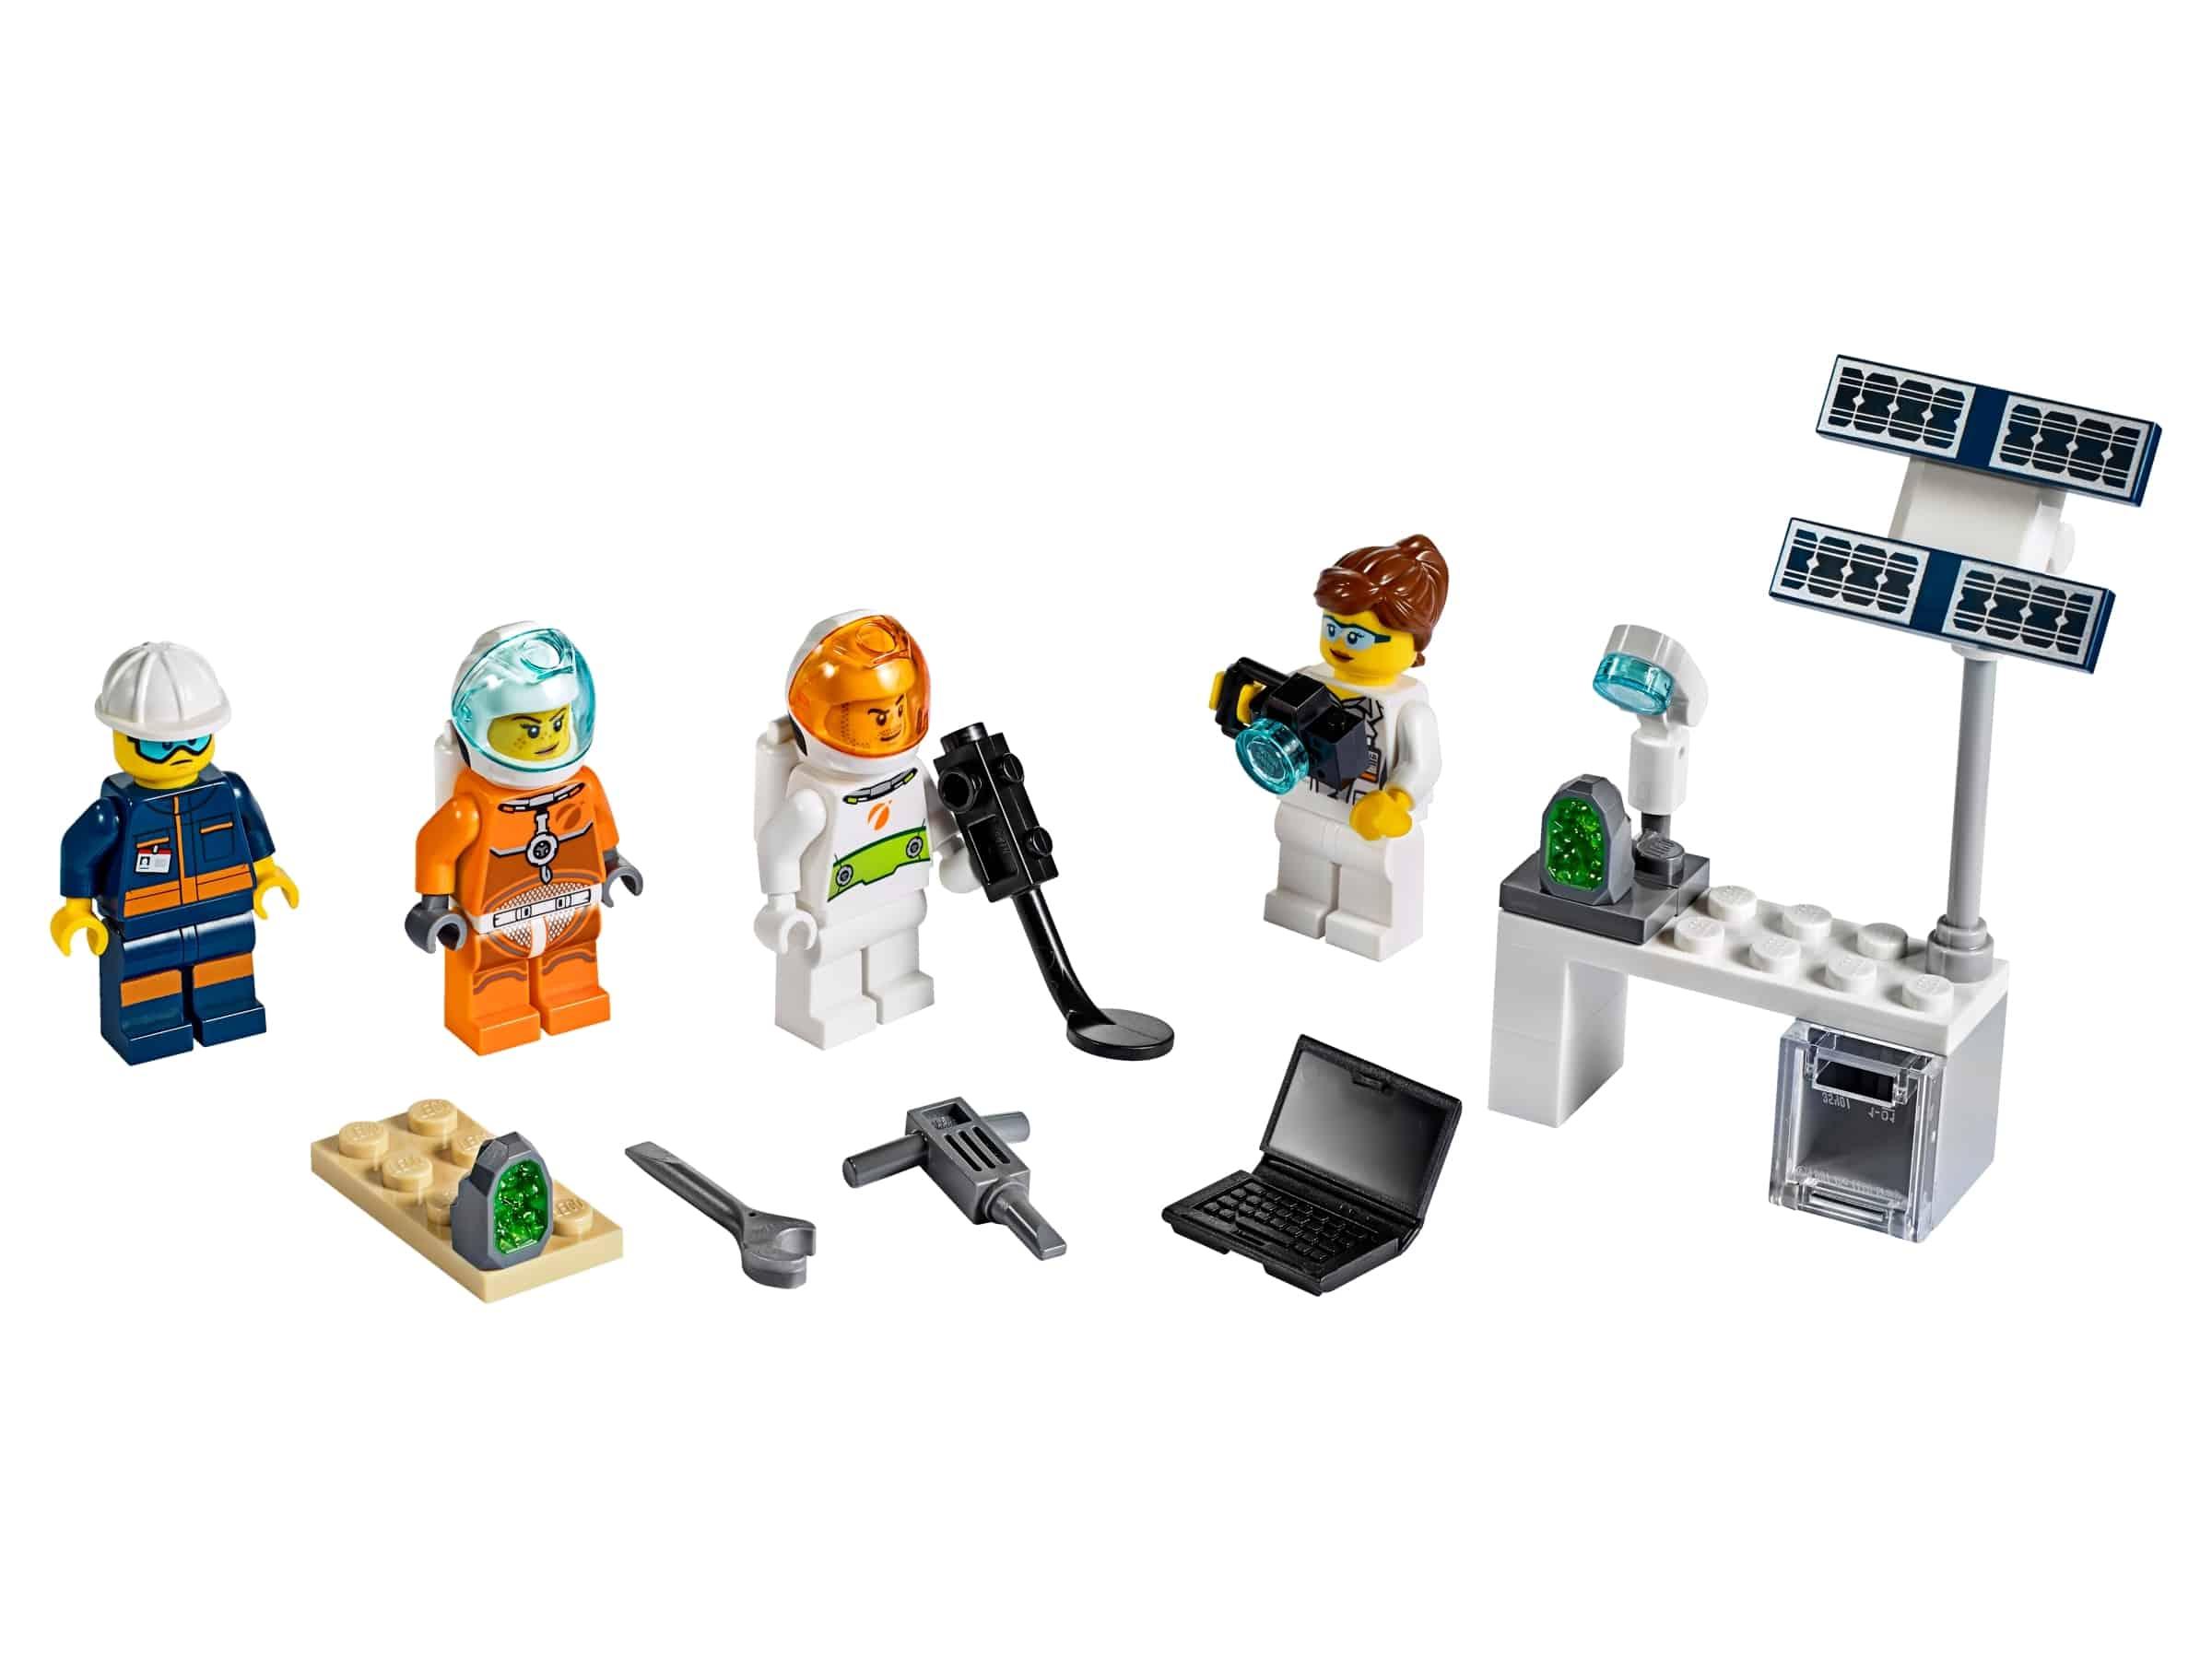 lego city minifigurenpakket 40345